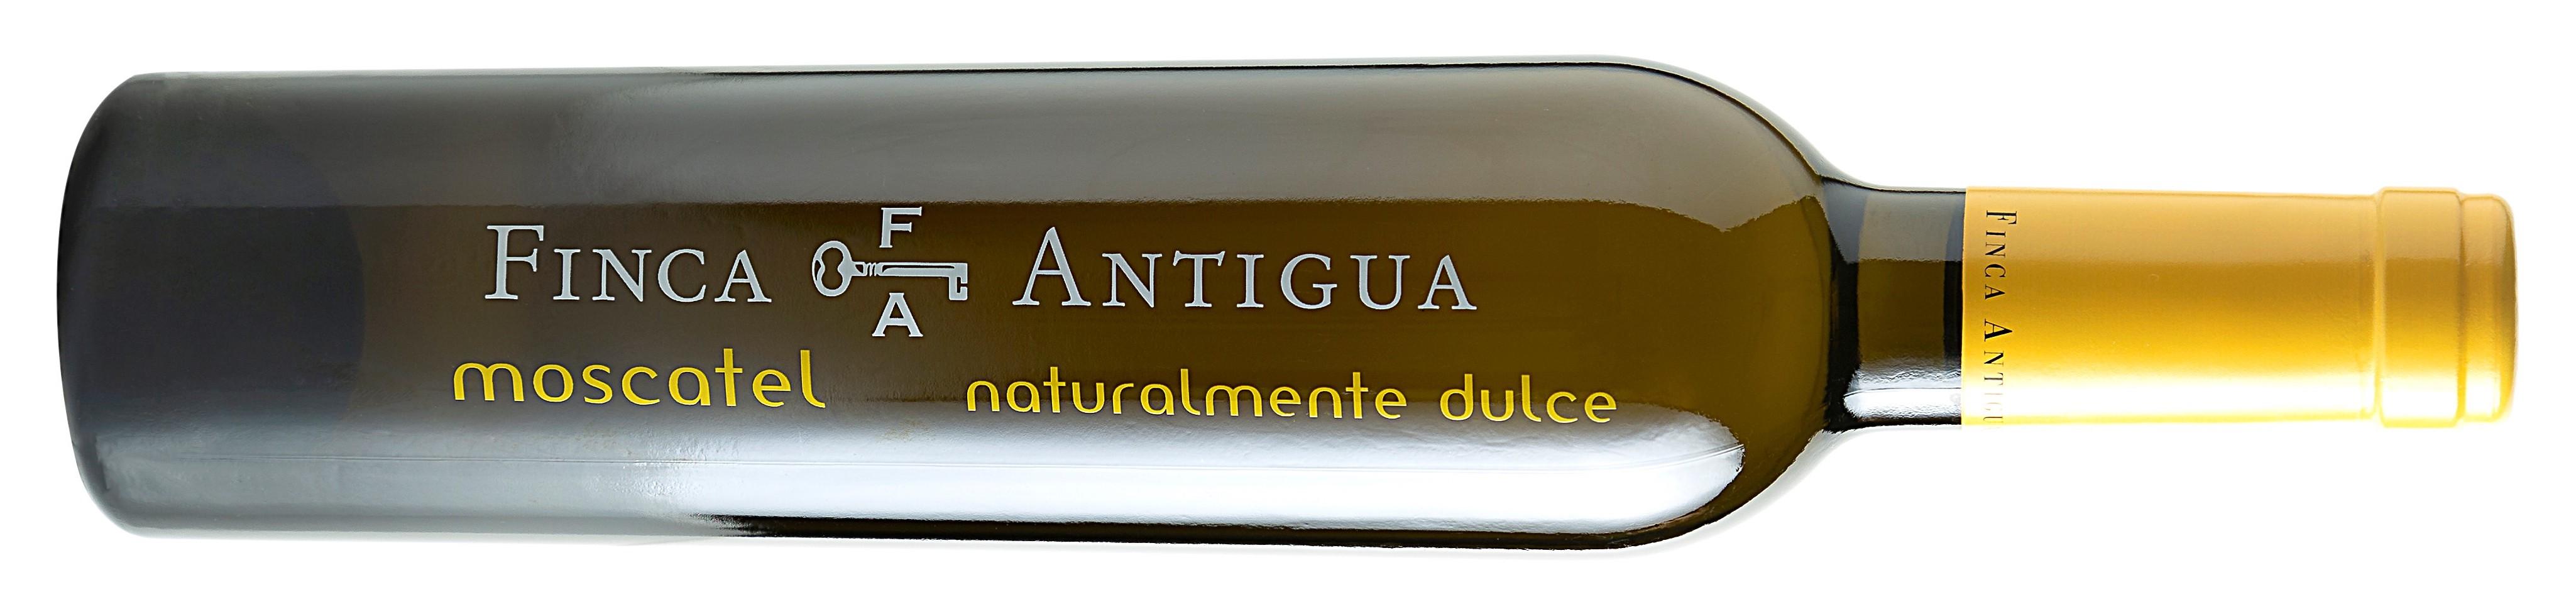 botella Finca Antigua Moscatel